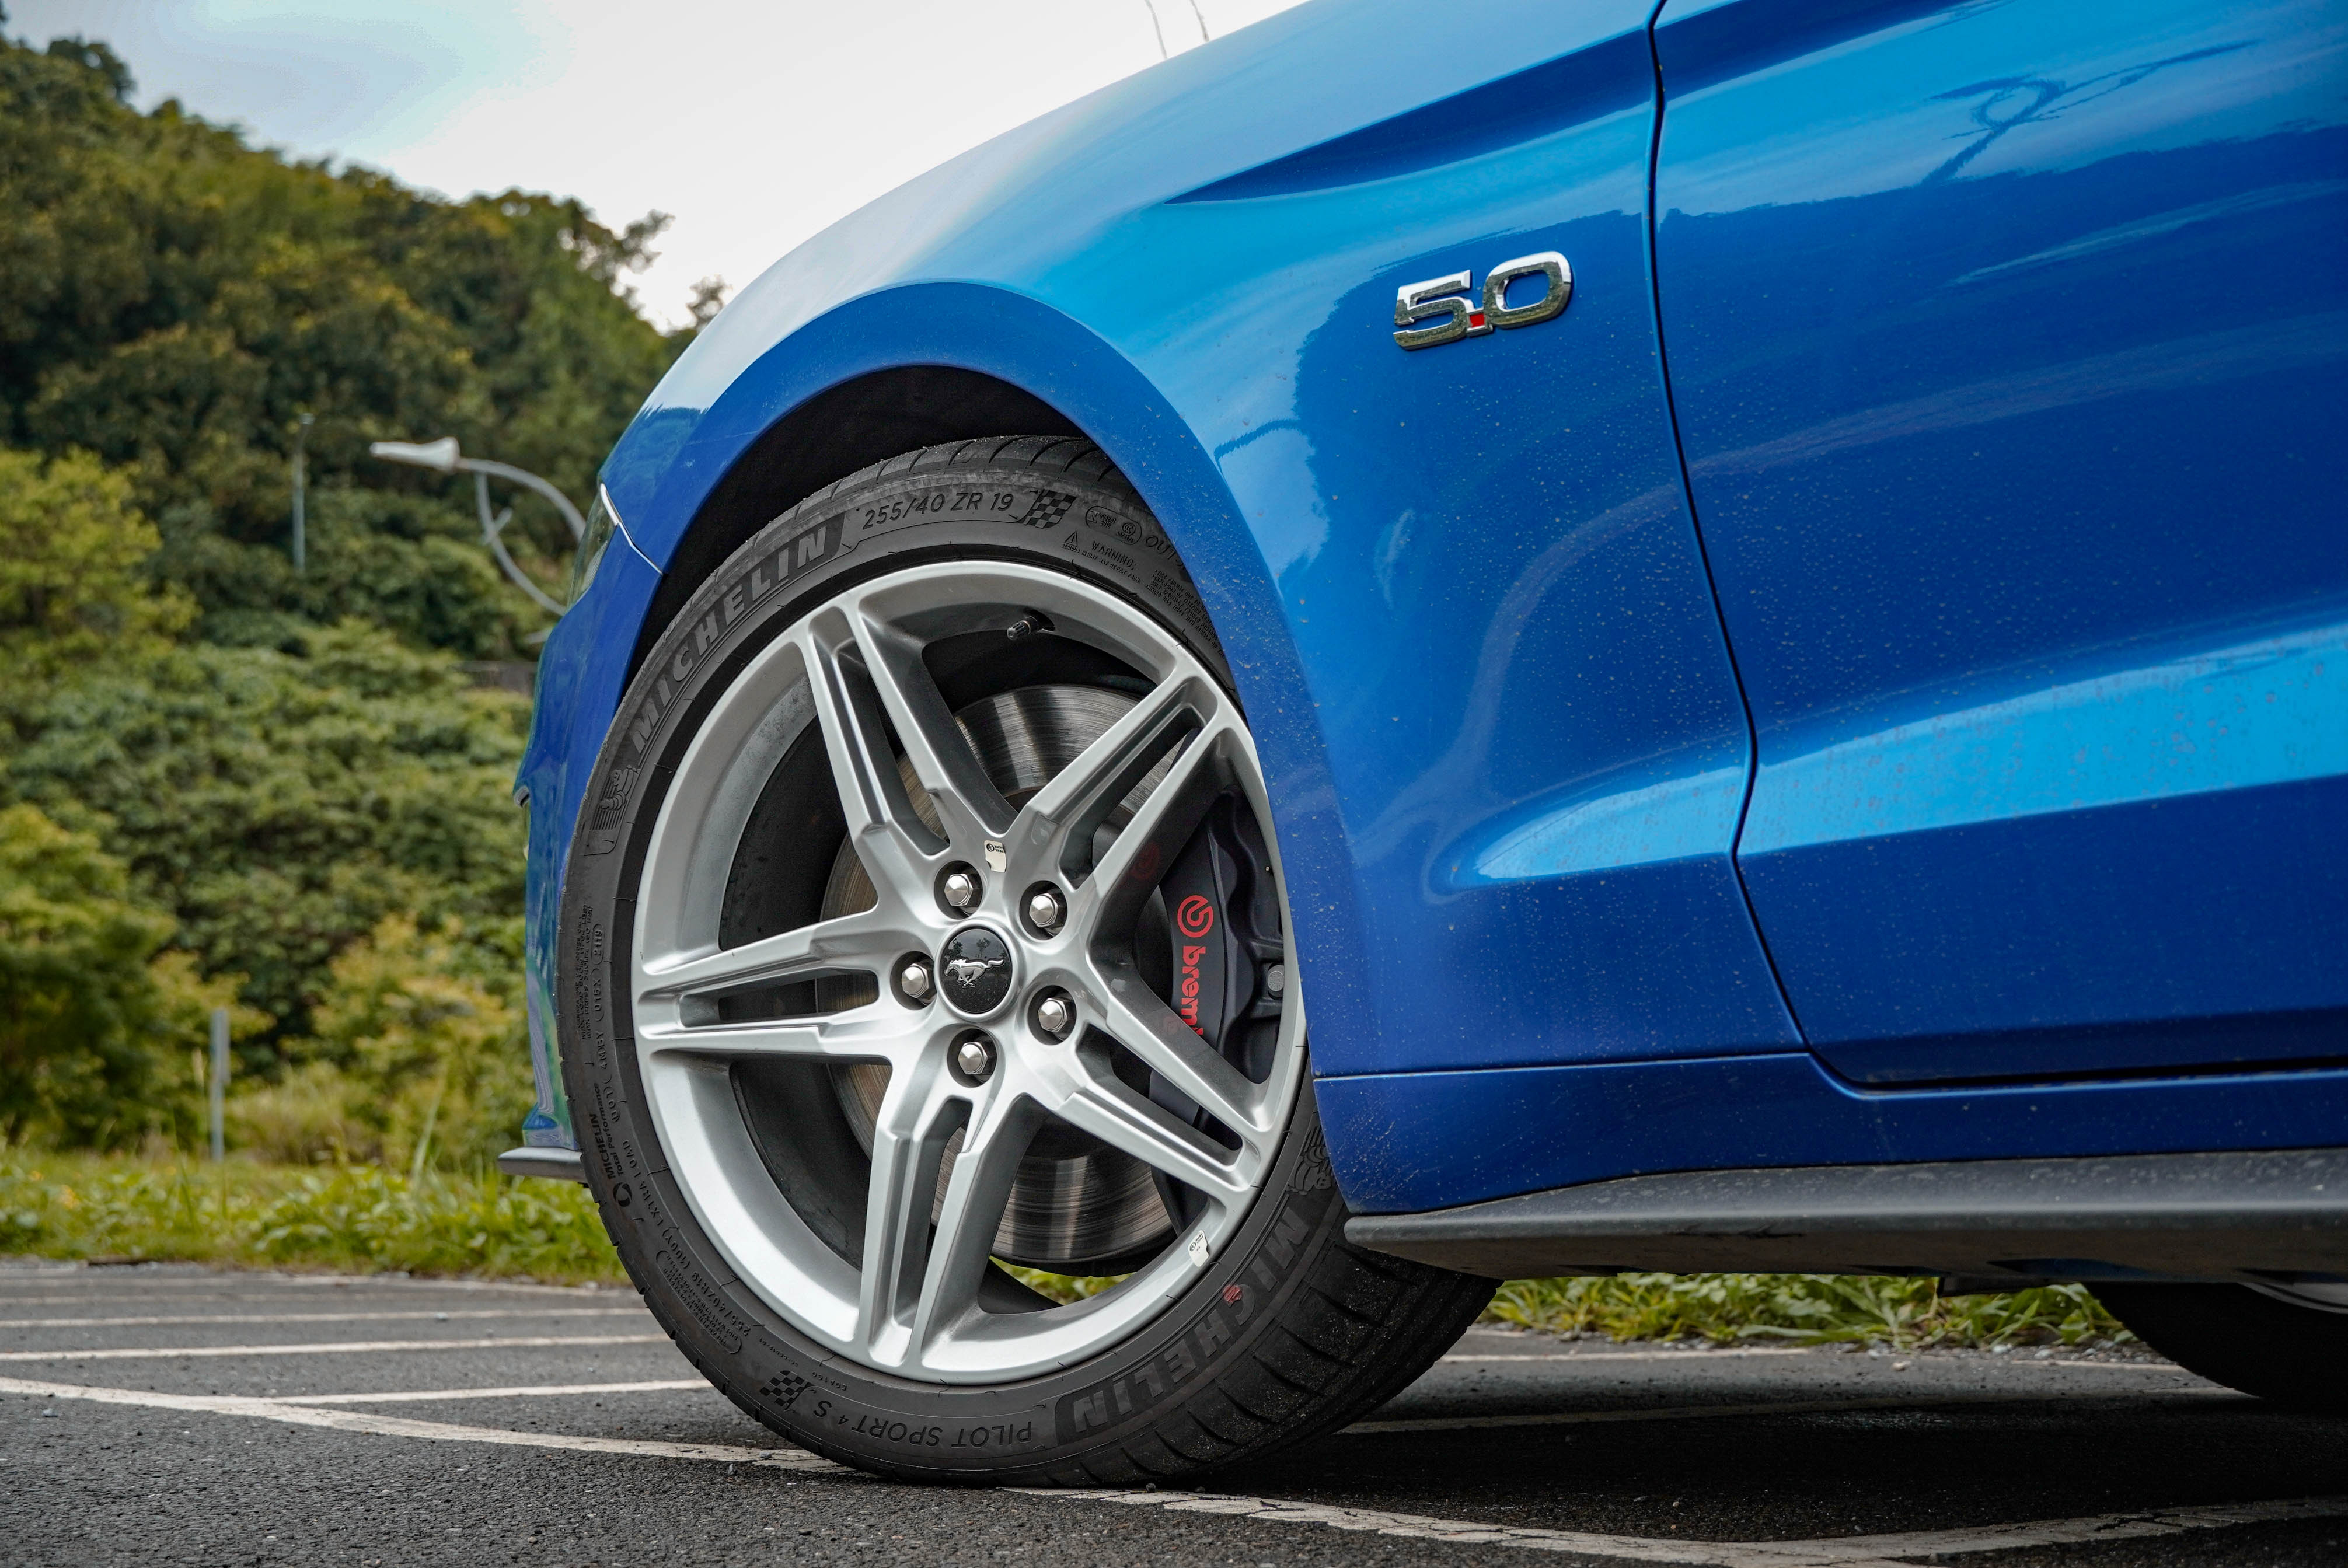 GT Premium 標配 19 吋輪圈及 Brembo 六活塞卡鉗。葉子板上有 5.0 徽章,表示買家是個勇者(稅金的部分)。